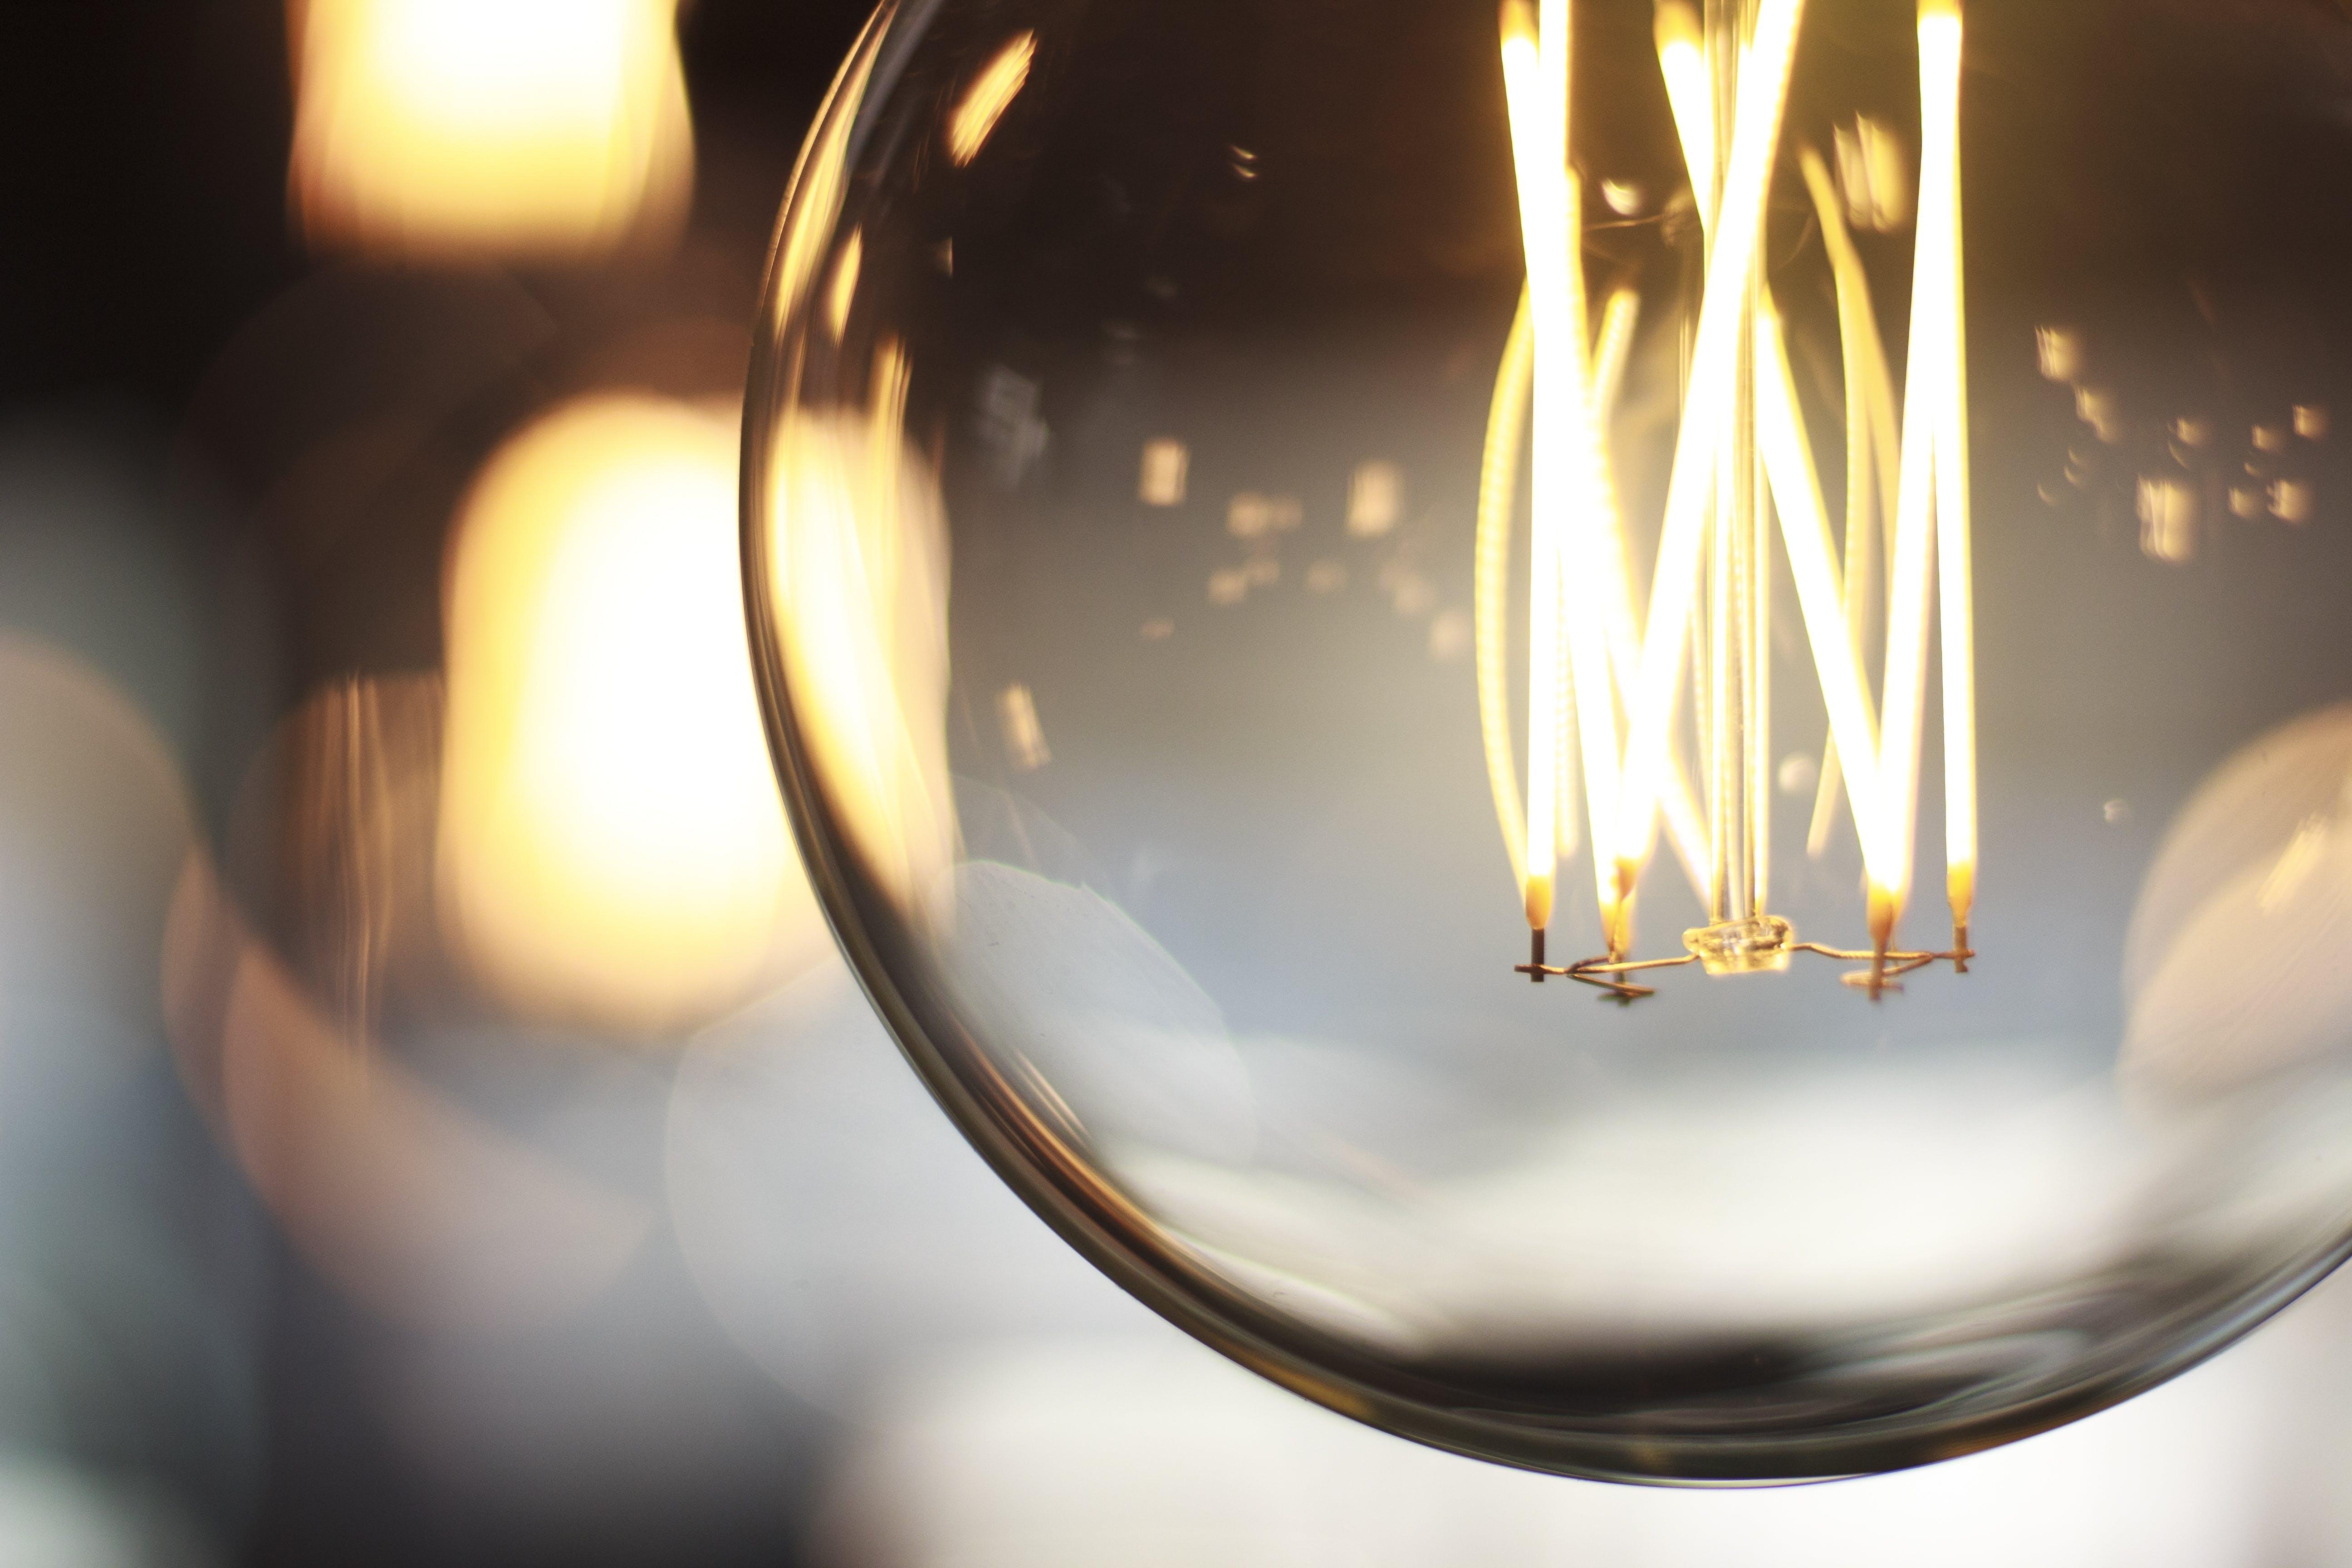 Free stock photo of light, glass, reflections, bokeh